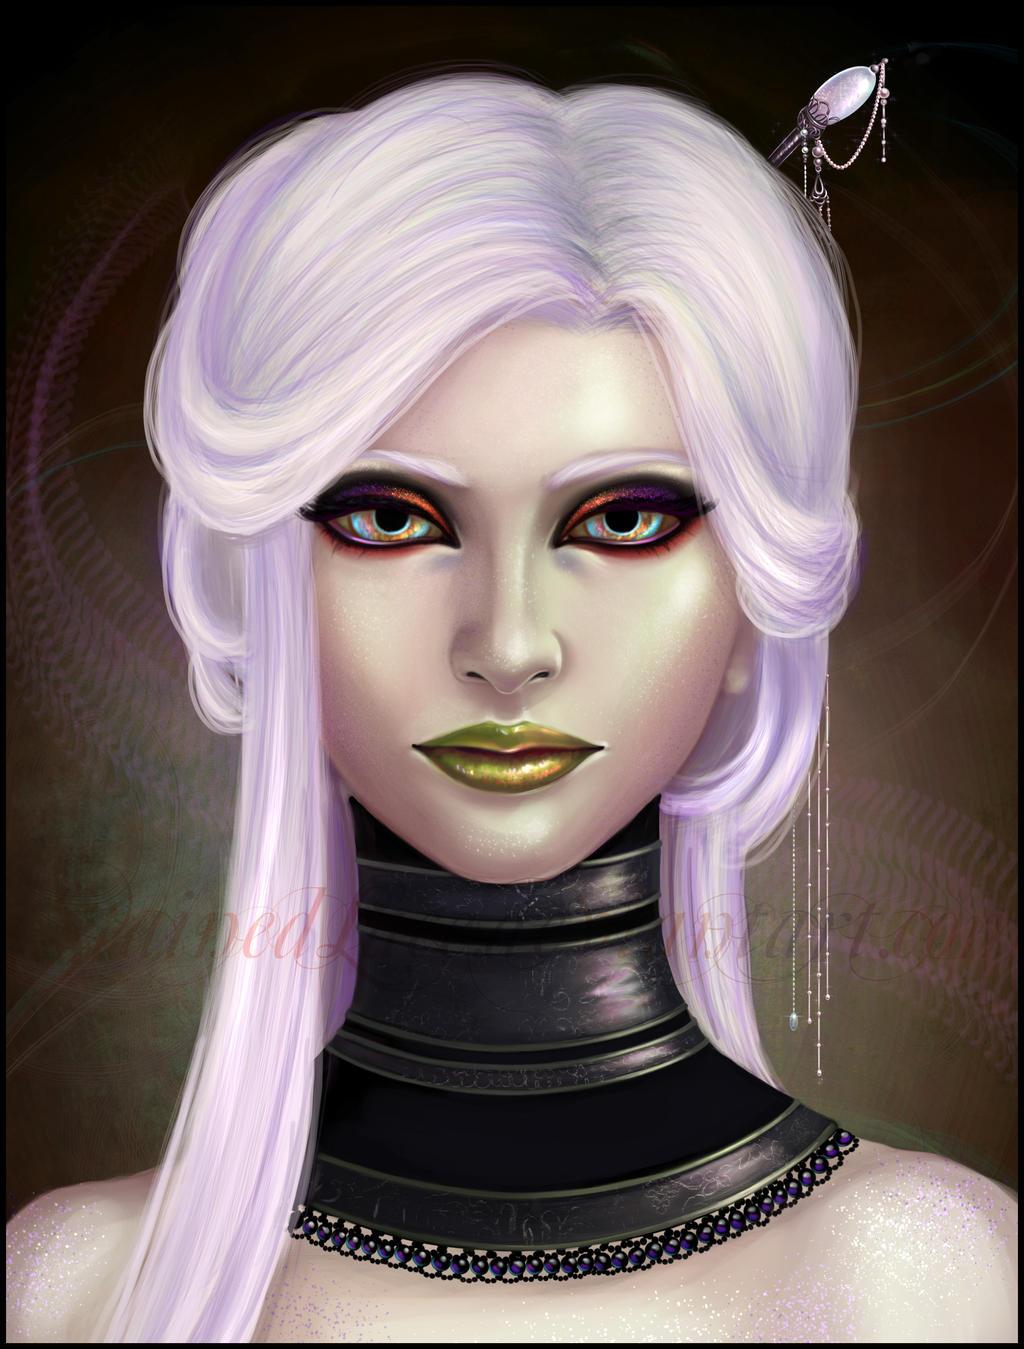 Lueva by StainedLace on DeviantArt